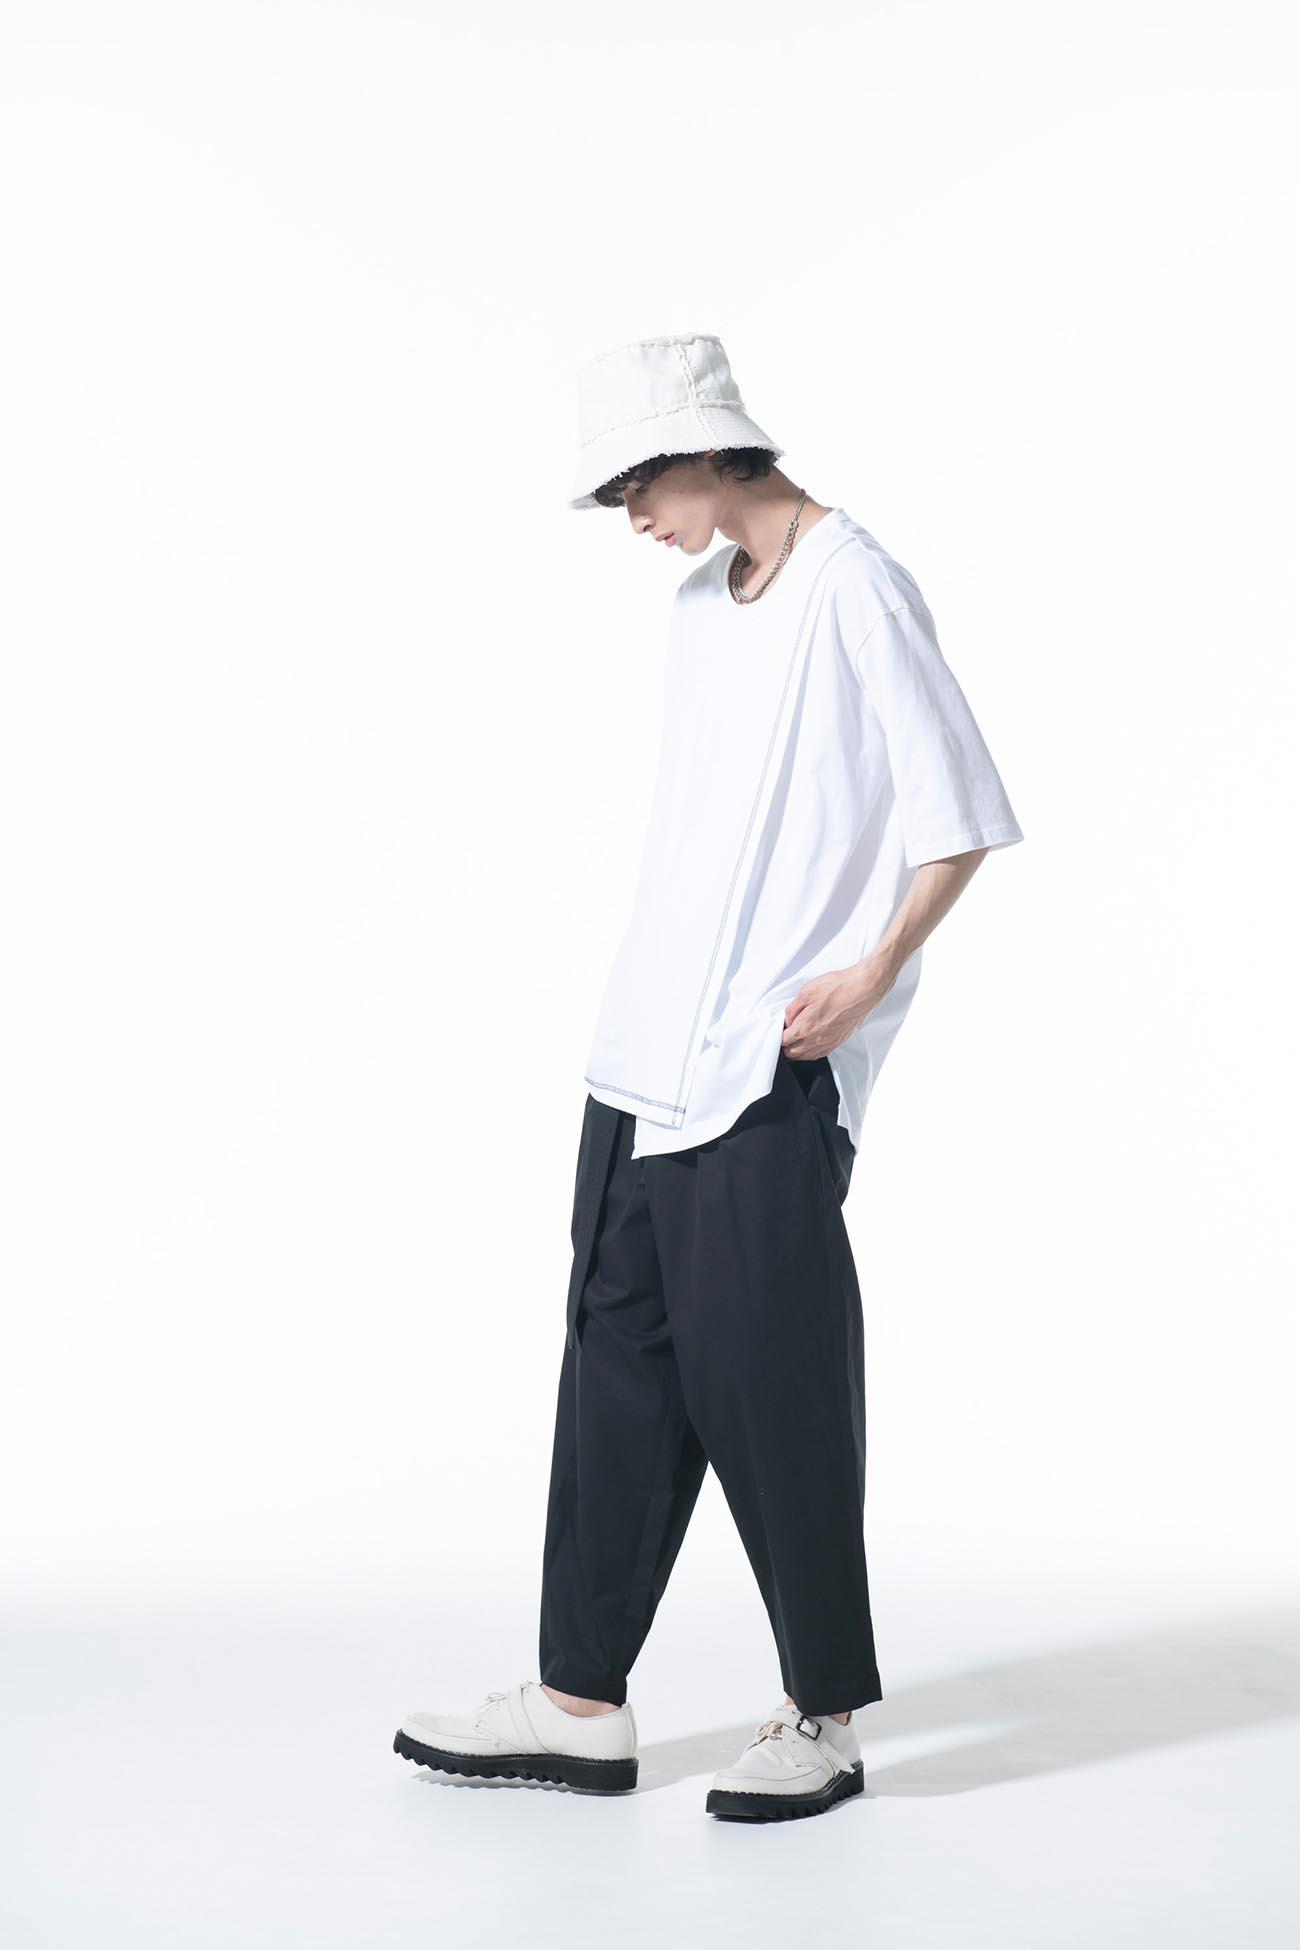 40/2 Cotton Jersey Crew Neck Half-Layered ColorLock Short Sleeve T-Shirt